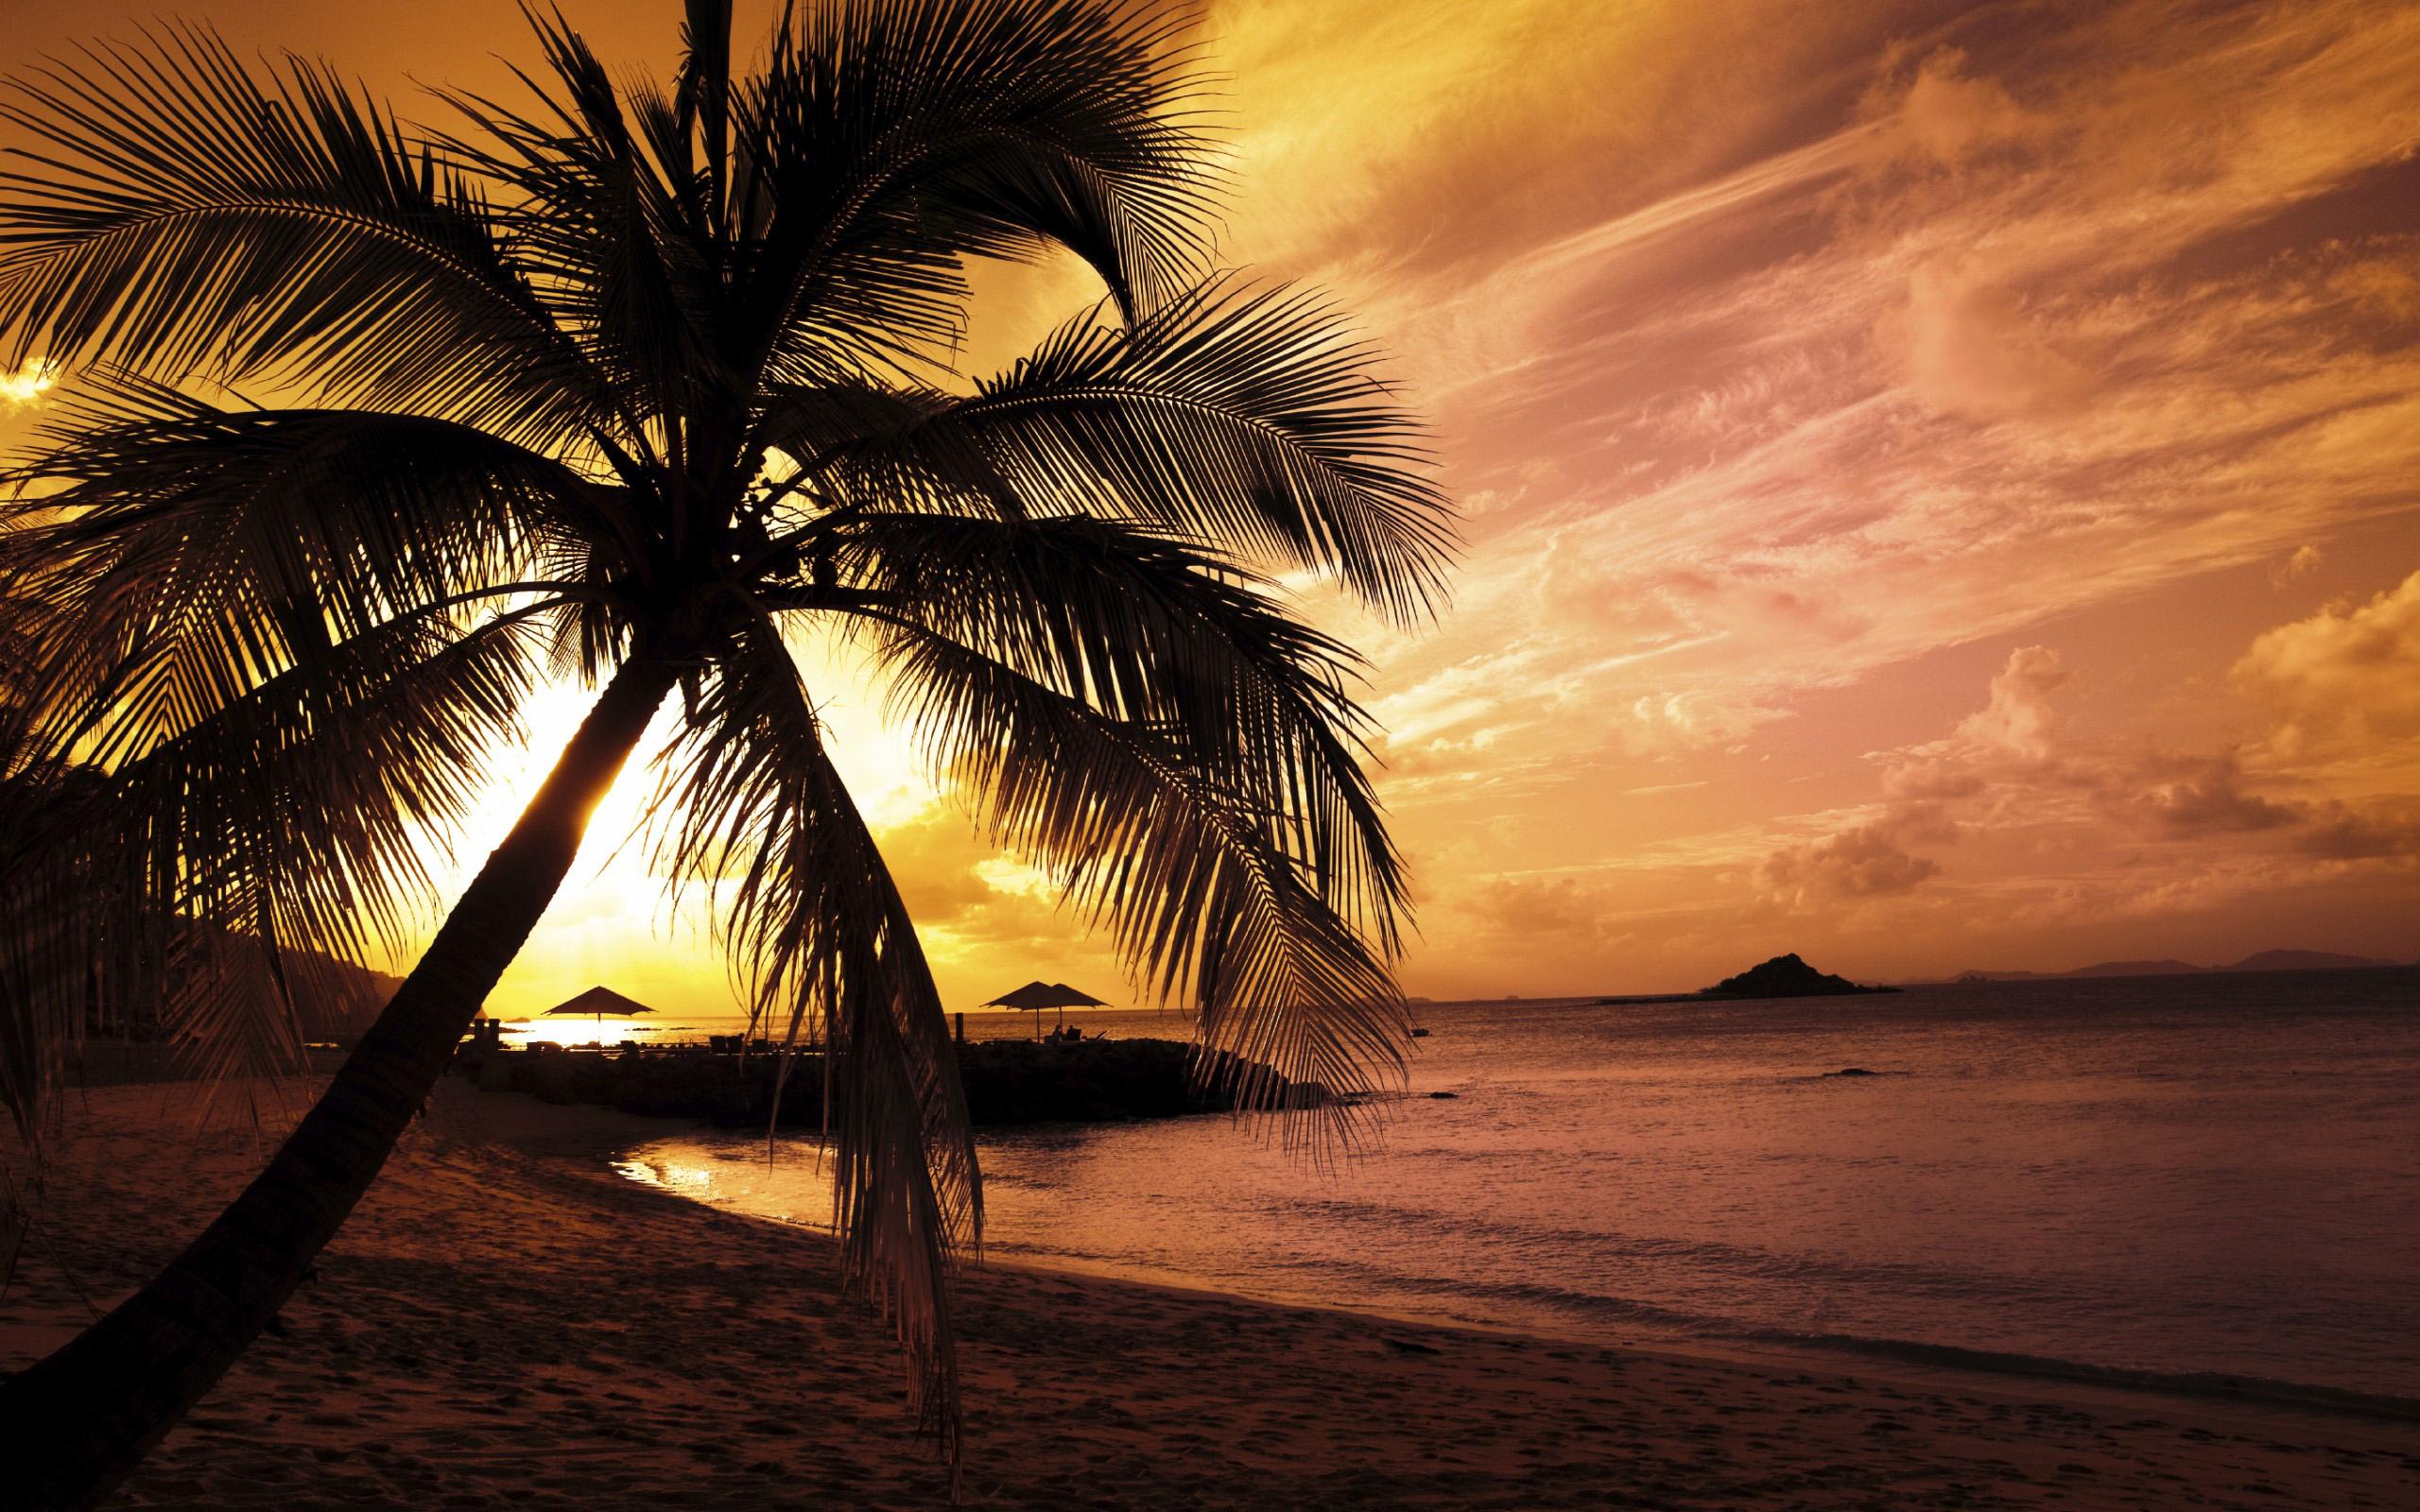 Sunset Palm Trees Hd Sunset Palm Trees HD 2560x1600 470 2560x1600